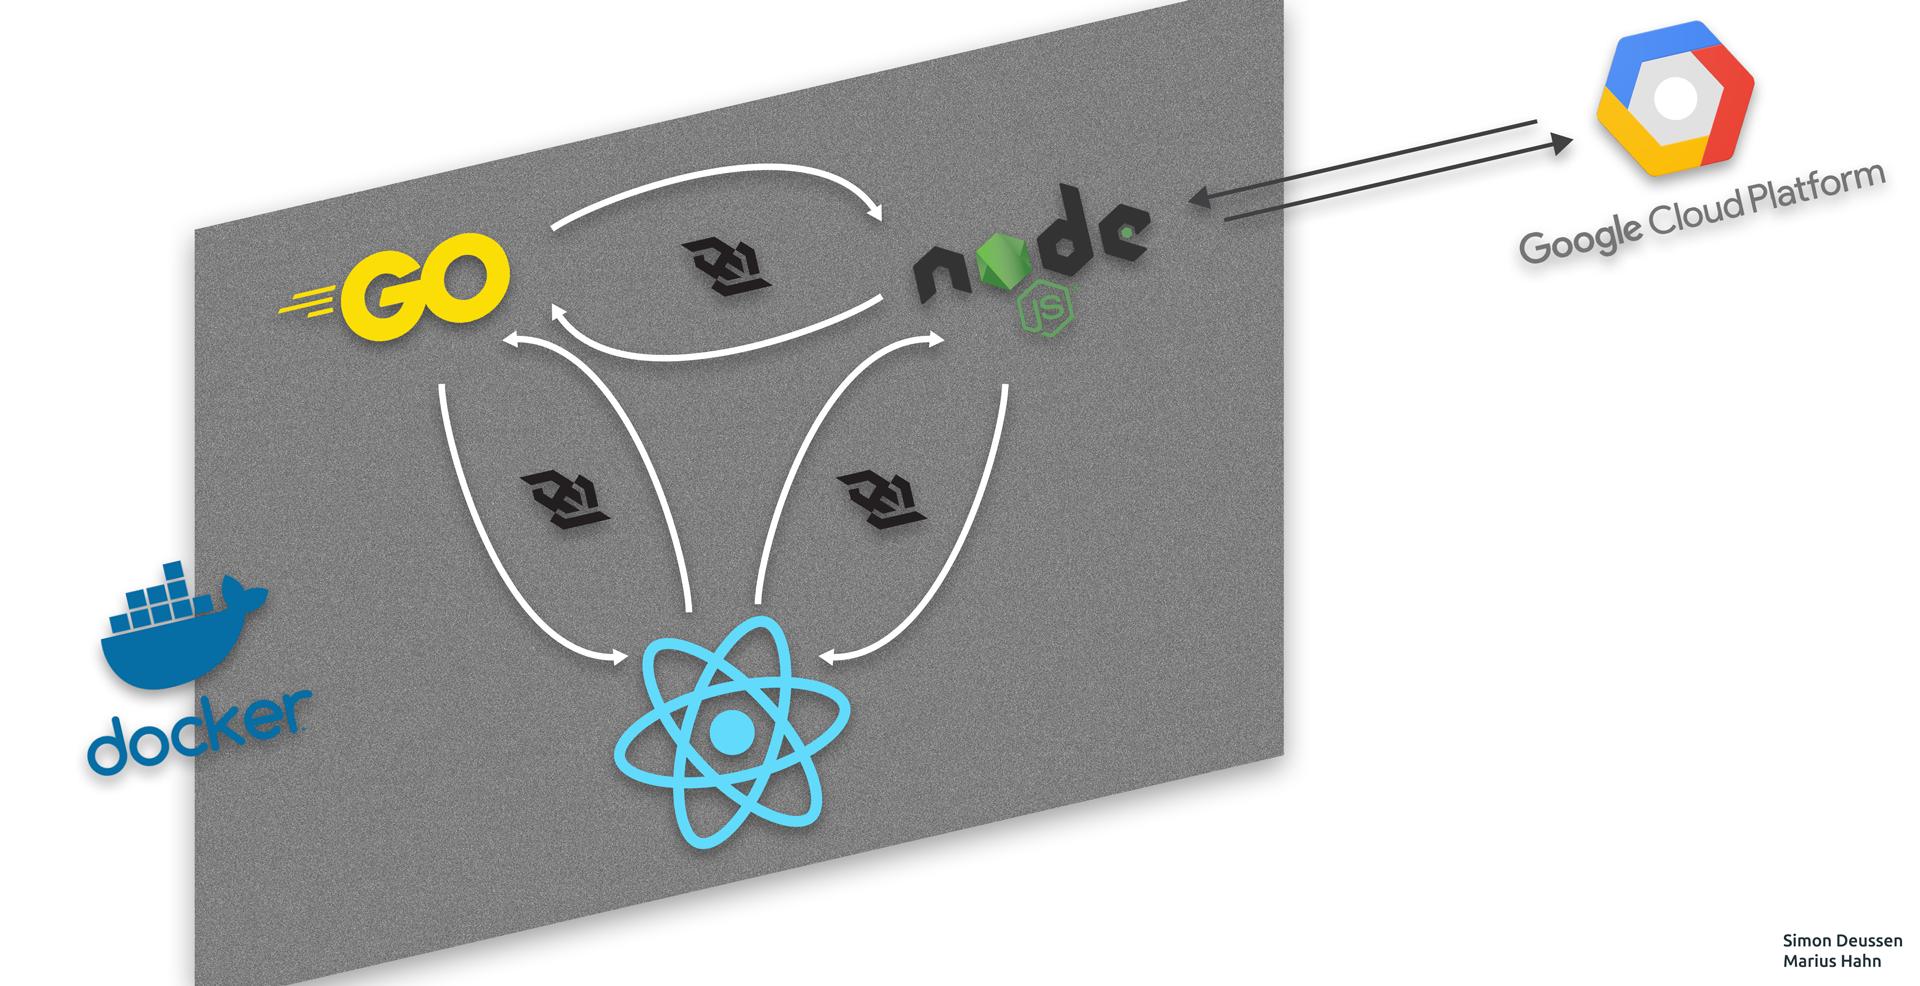 Using the power of google cloud API: A dockerized node app